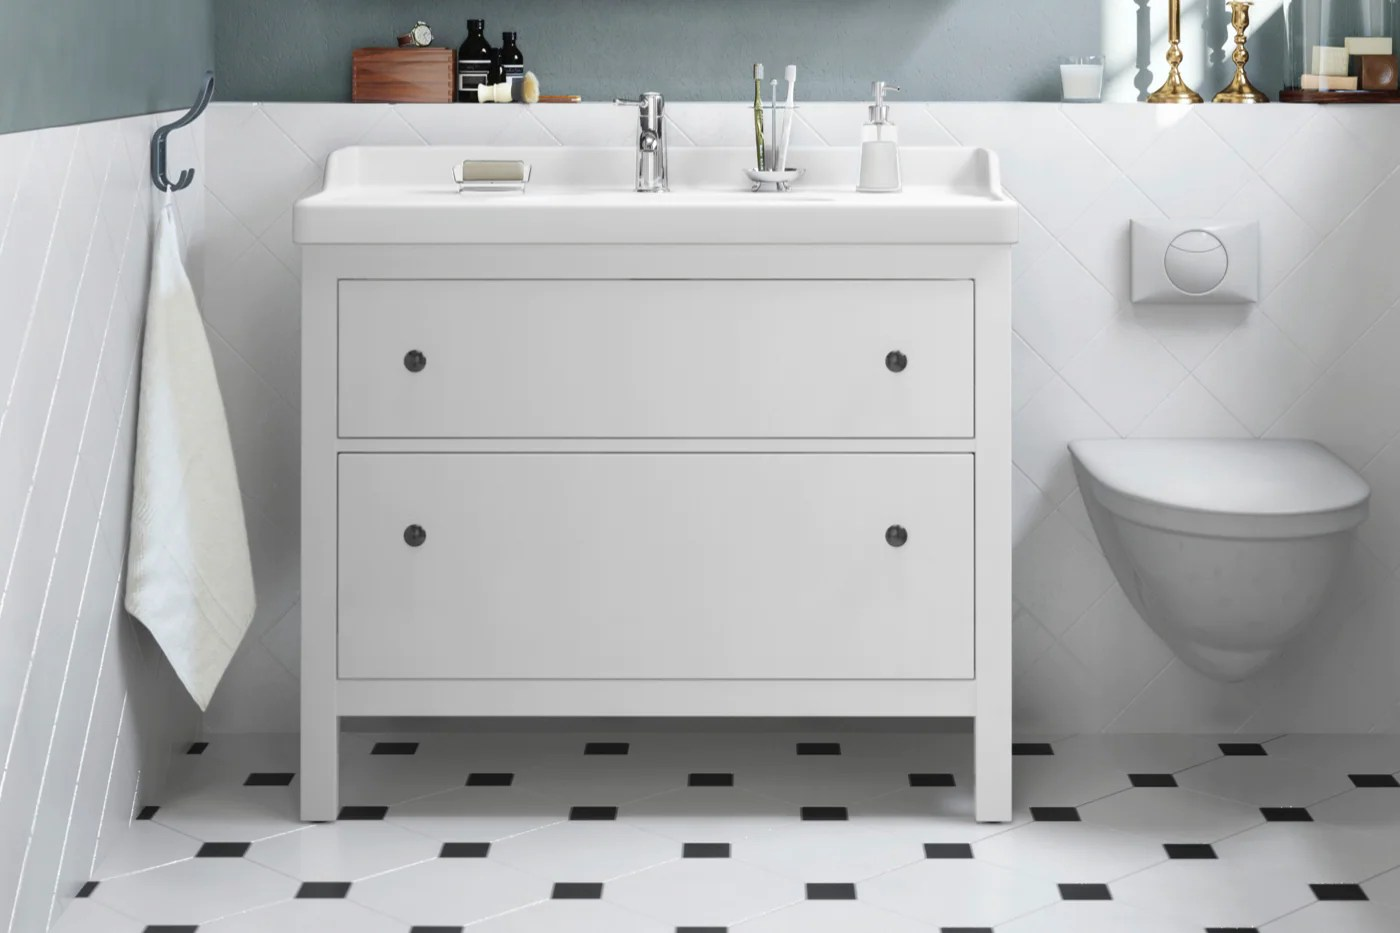 ikea badezimmer unterschrank   atbaldwin